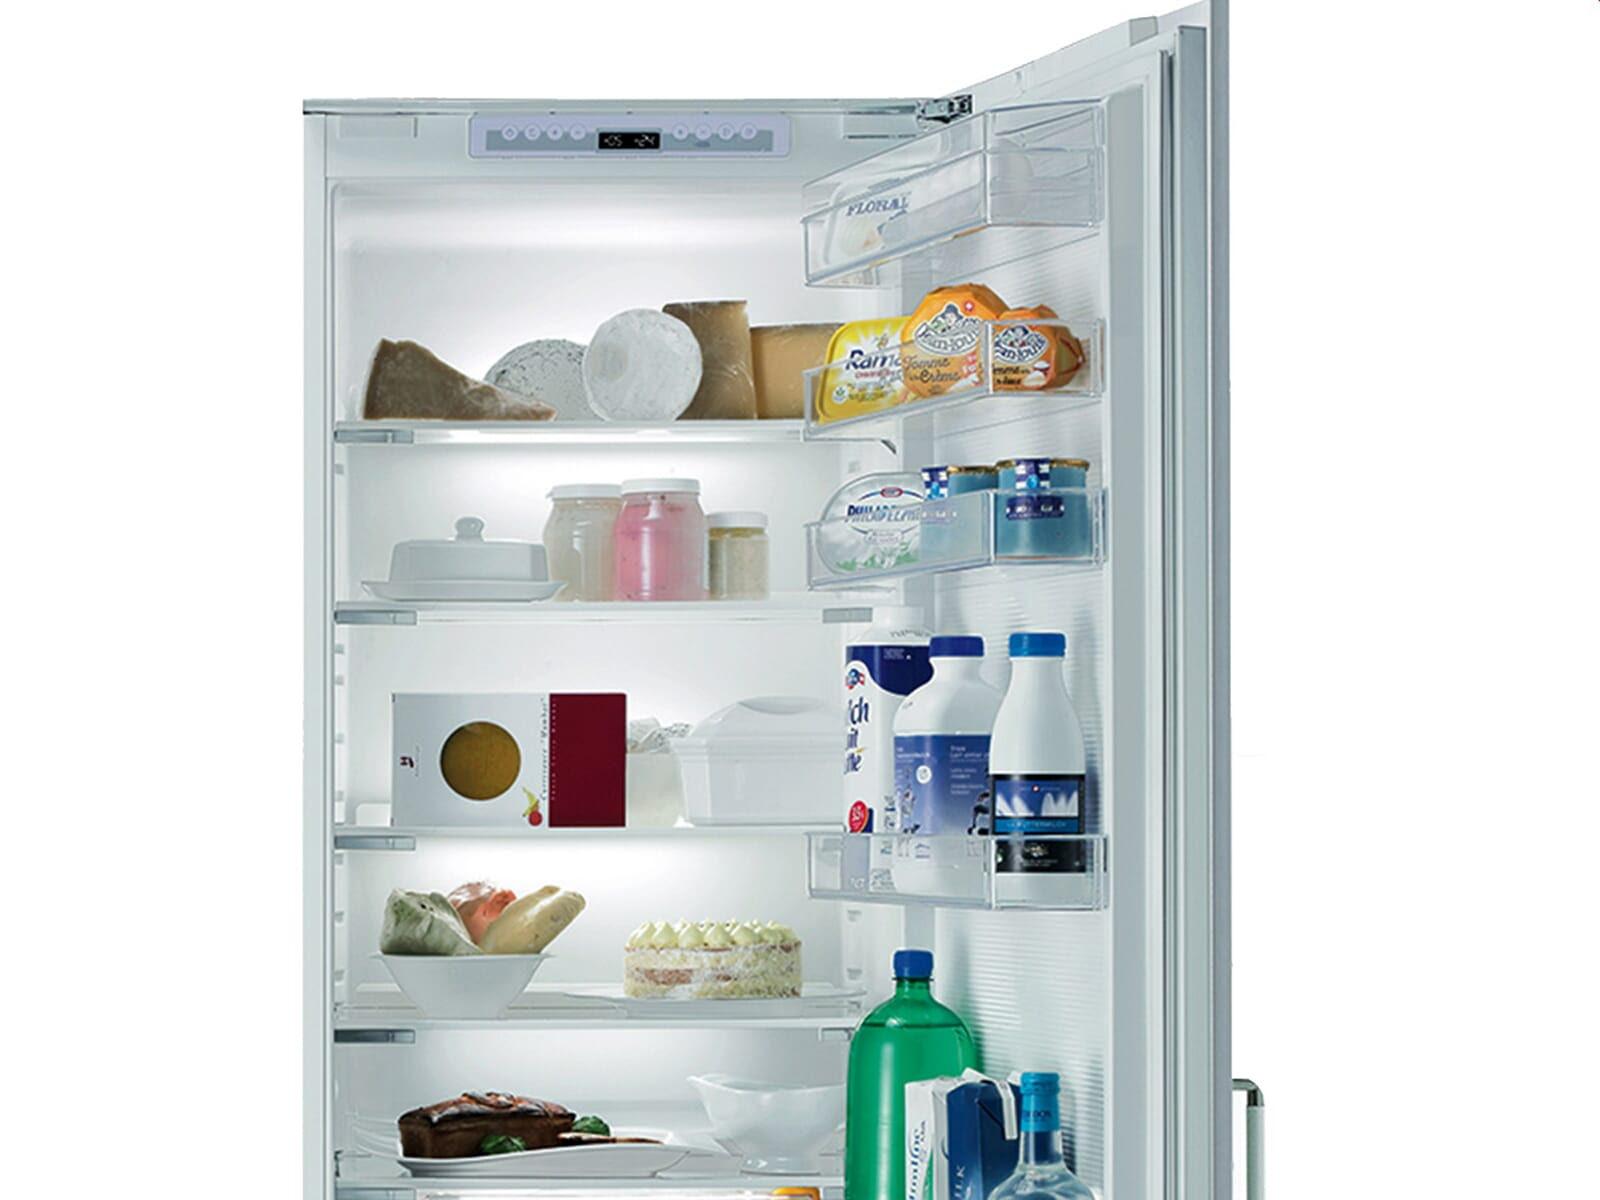 Aeg Kühlschrank Santo Bedienungsanleitung : Aeg santo kühlschrank bedienungsanleitung deutsch stand kühl